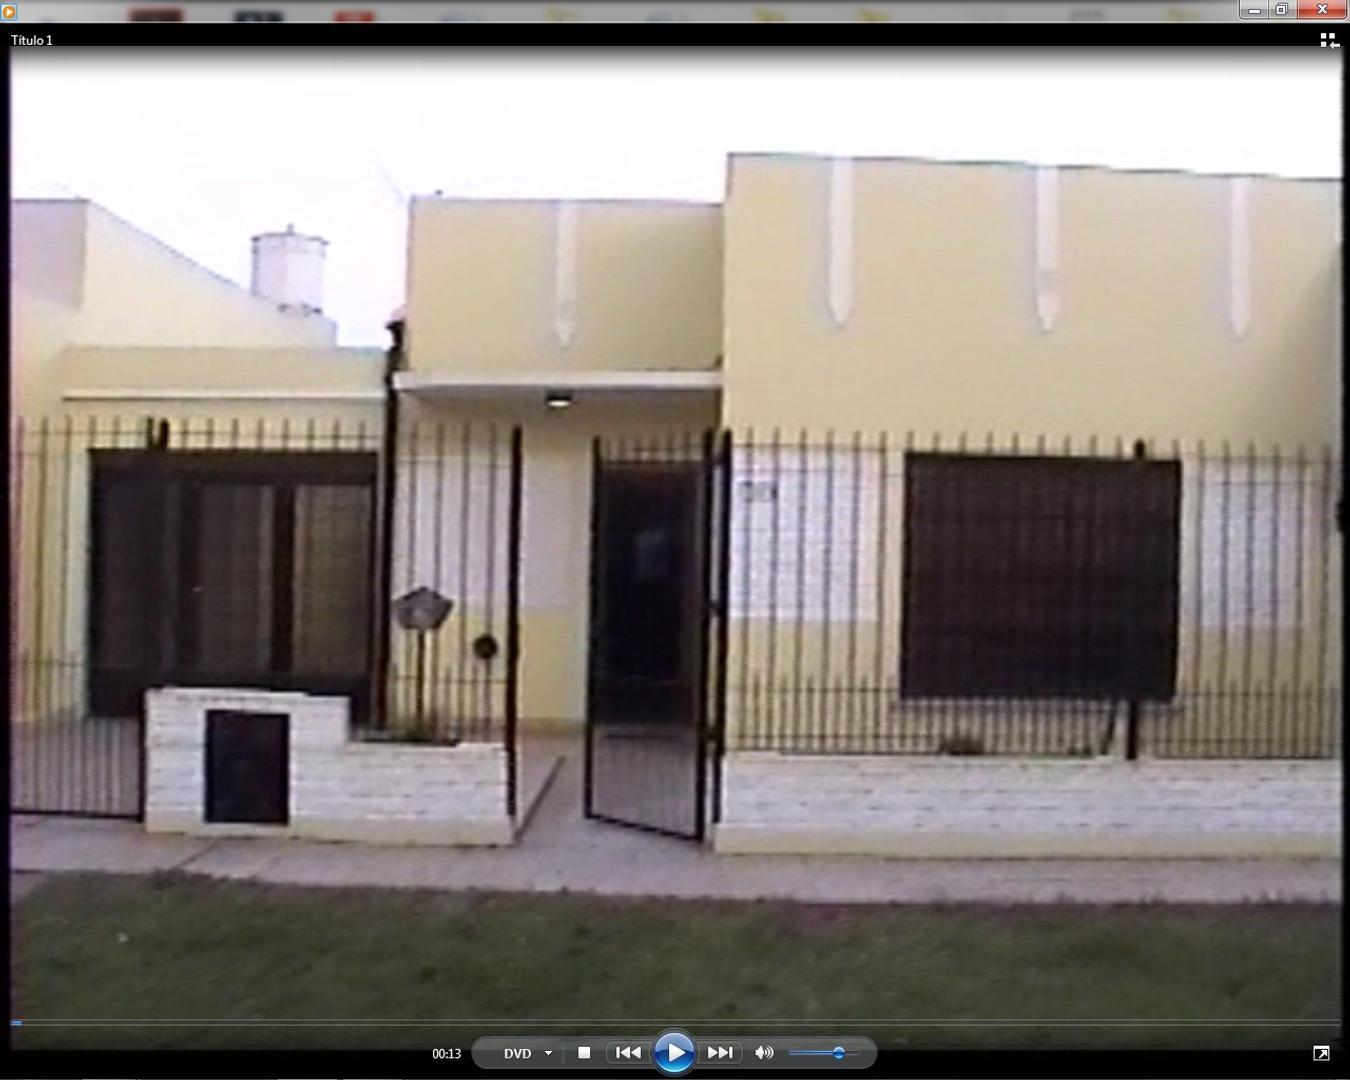 EXCELENTE CASA   CON TODOS LOS SERVICIOS BARRIO -SAN BERNARDO LUJAN BS. AS. APTO CREDITO.